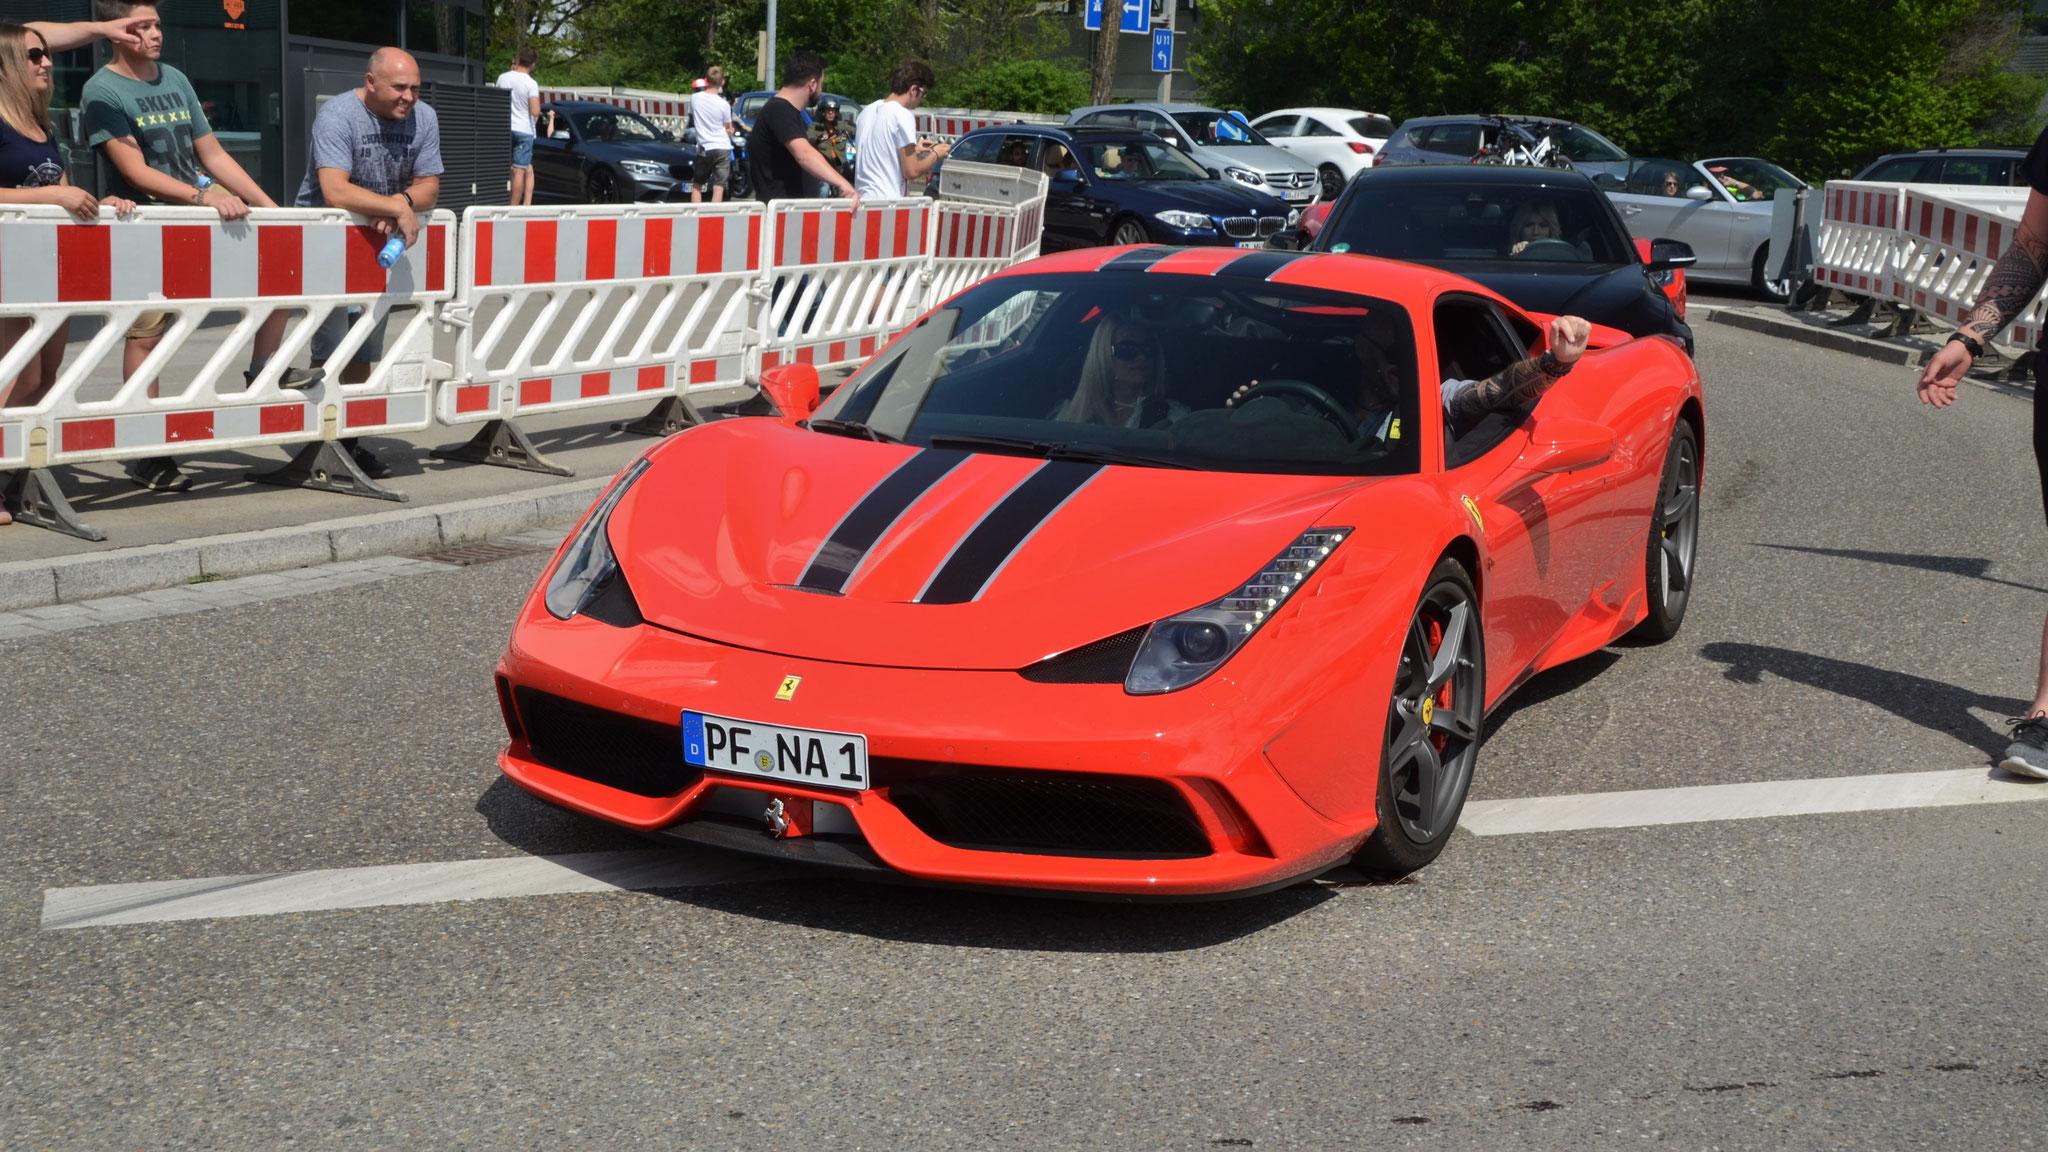 Ferrari 458 Speciale - PF-NA-1